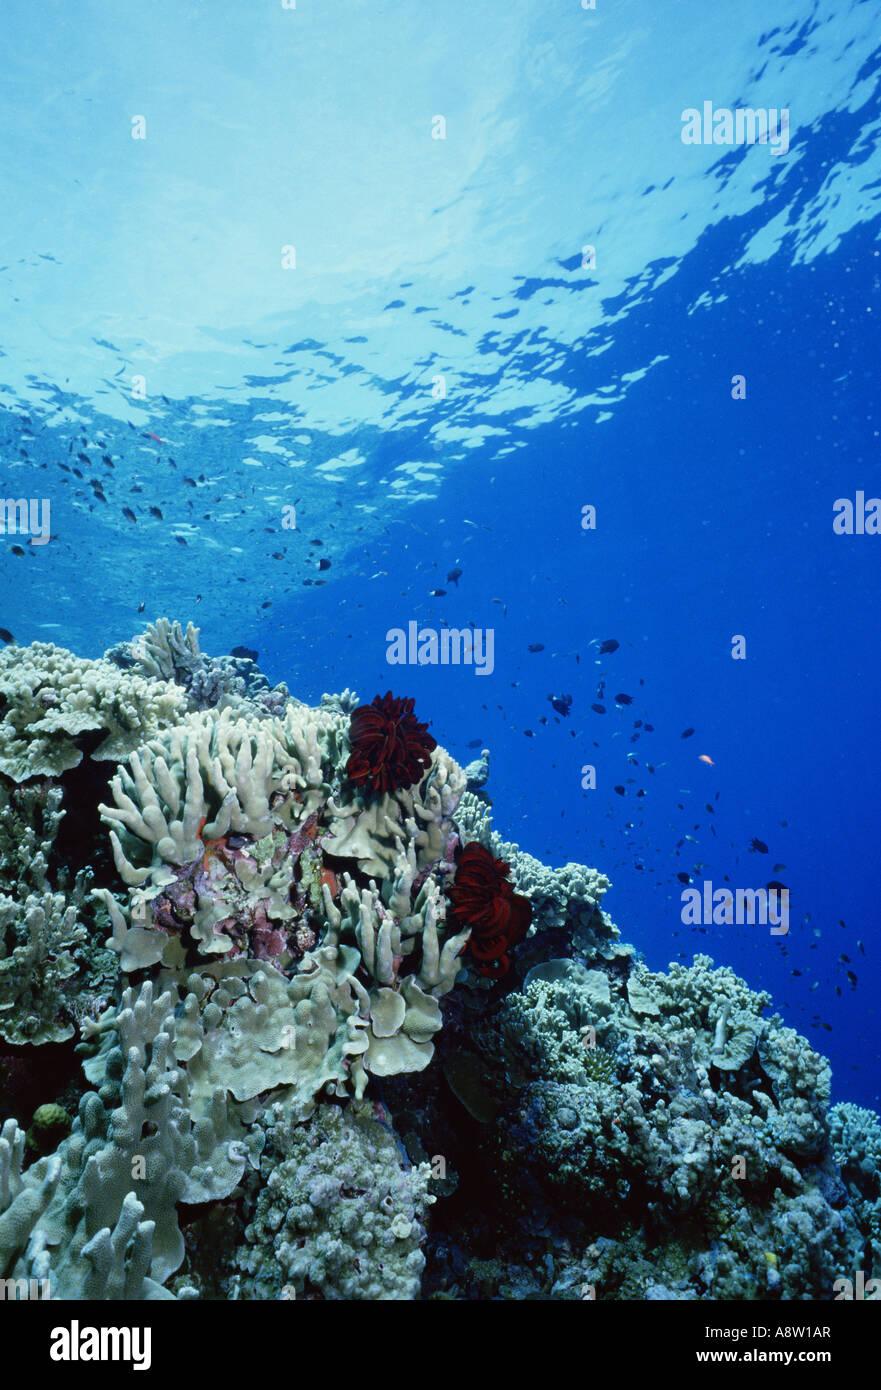 Papua Nueva Guinea viaje submarino de Arrecifes de Coral Imagen De Stock